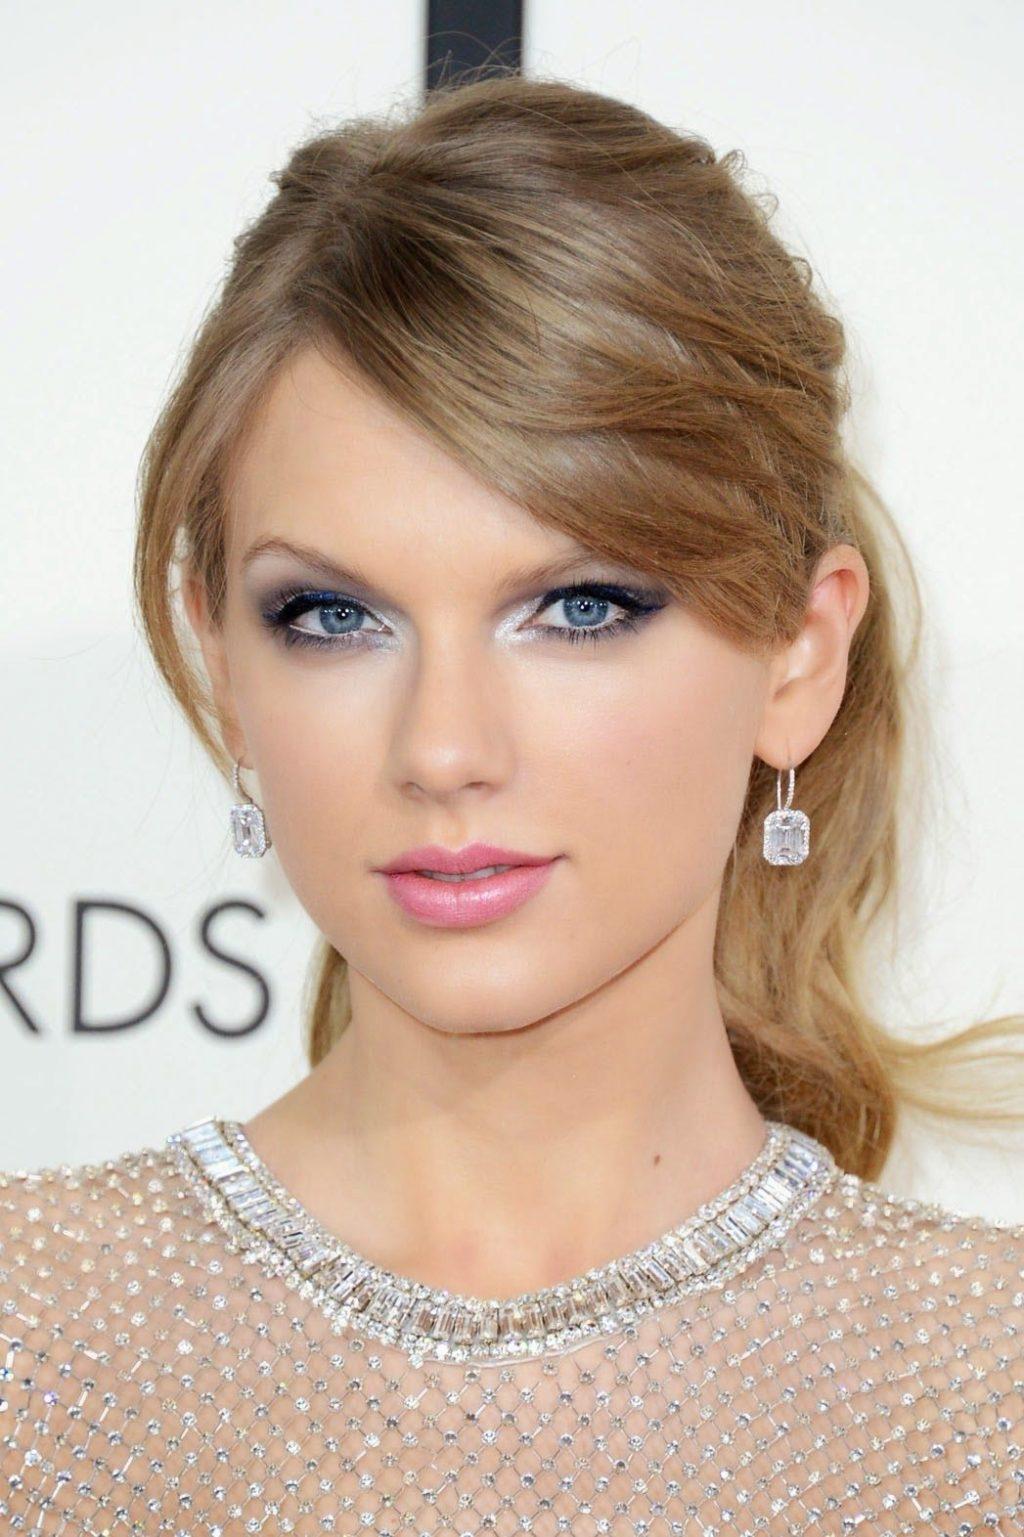 bluish-grey-smokey-eye-2-1024x1537 60+ Hottest Smokey Eye Makeup Looks in 2020